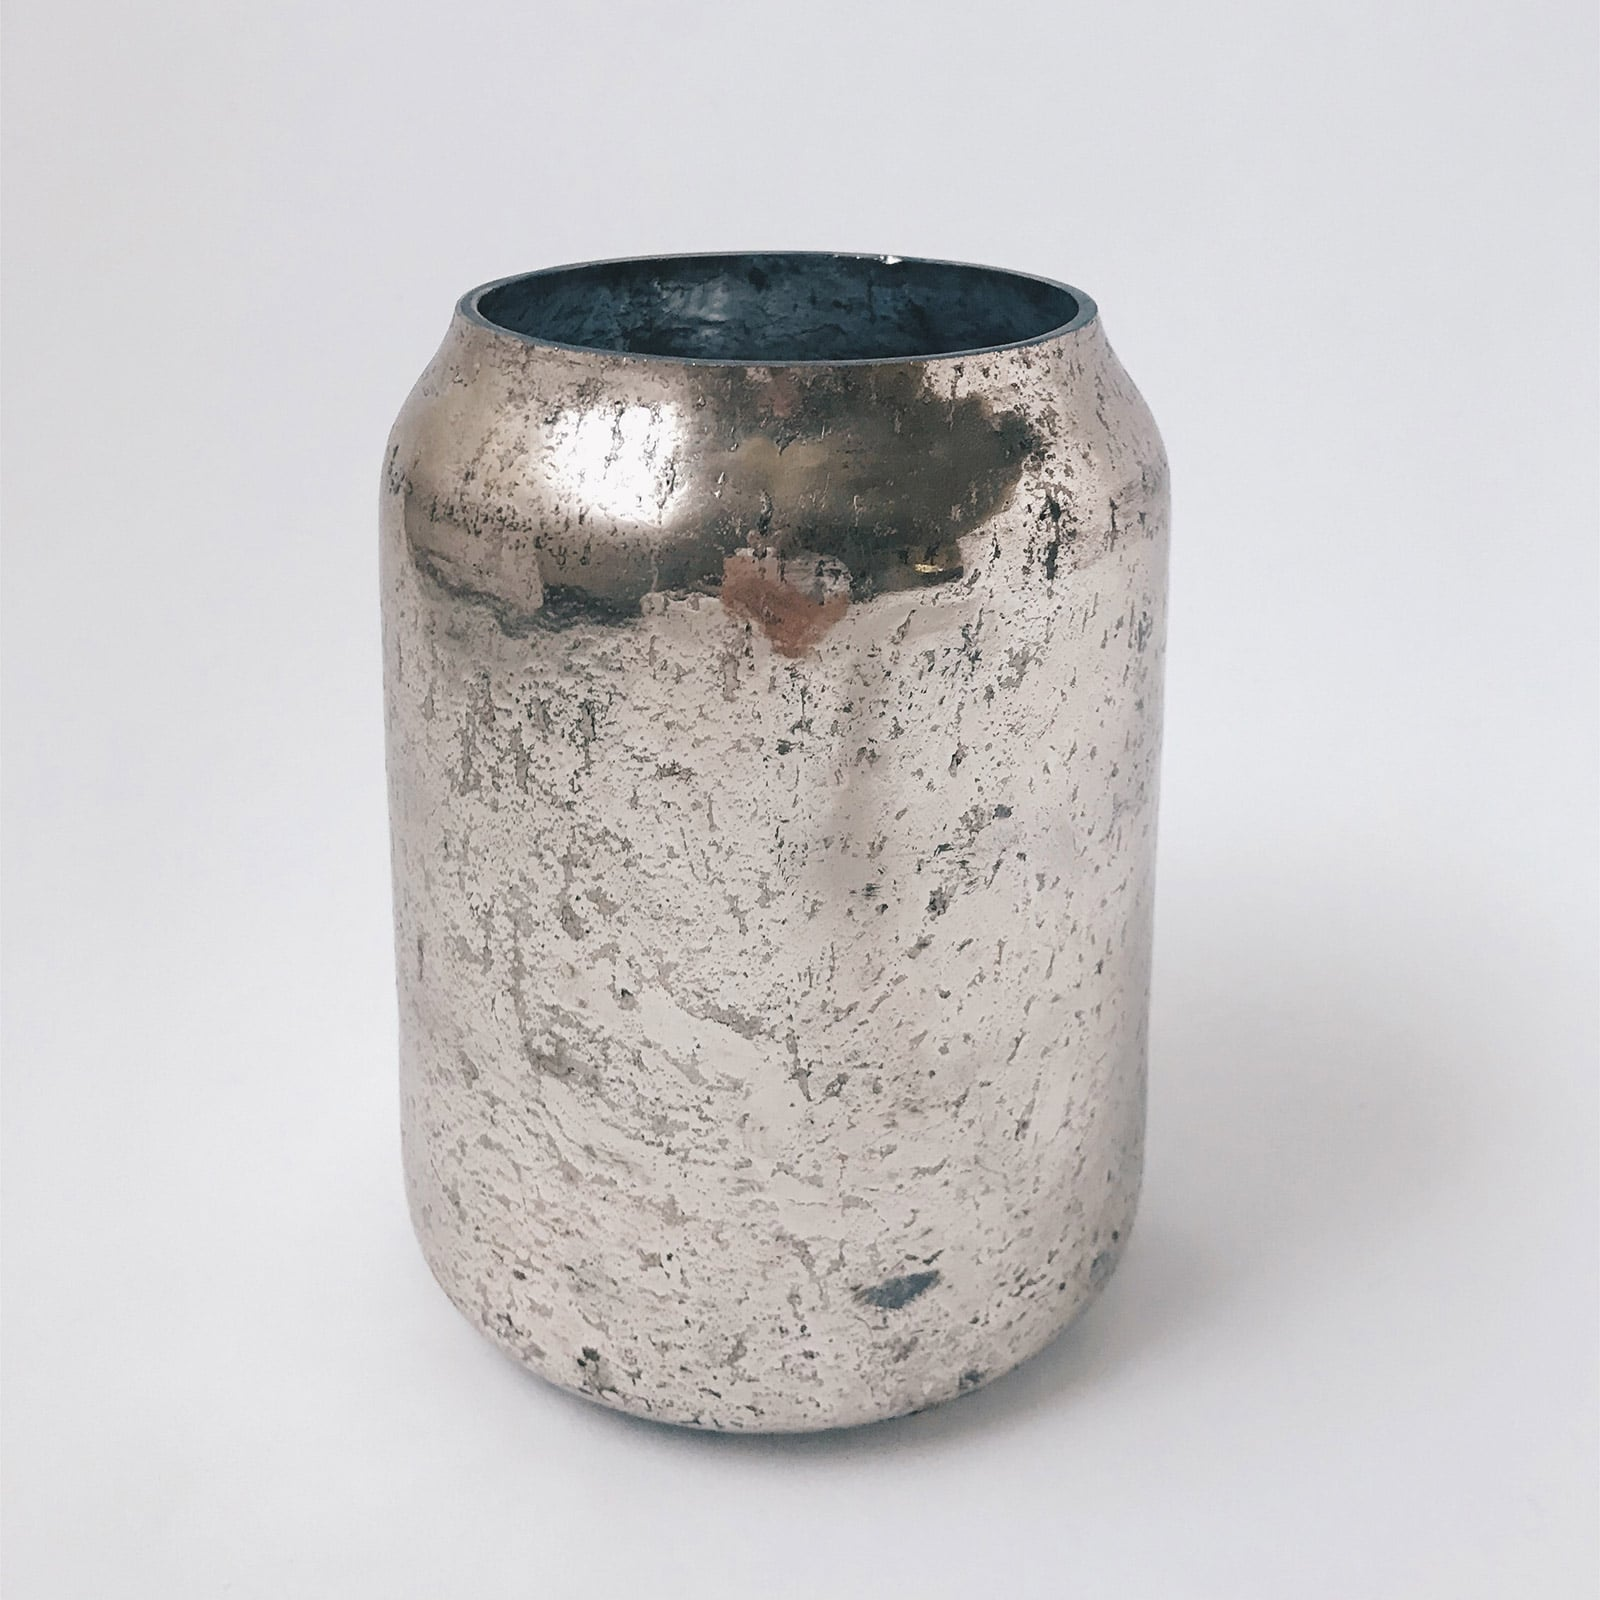 Silver, glass vase